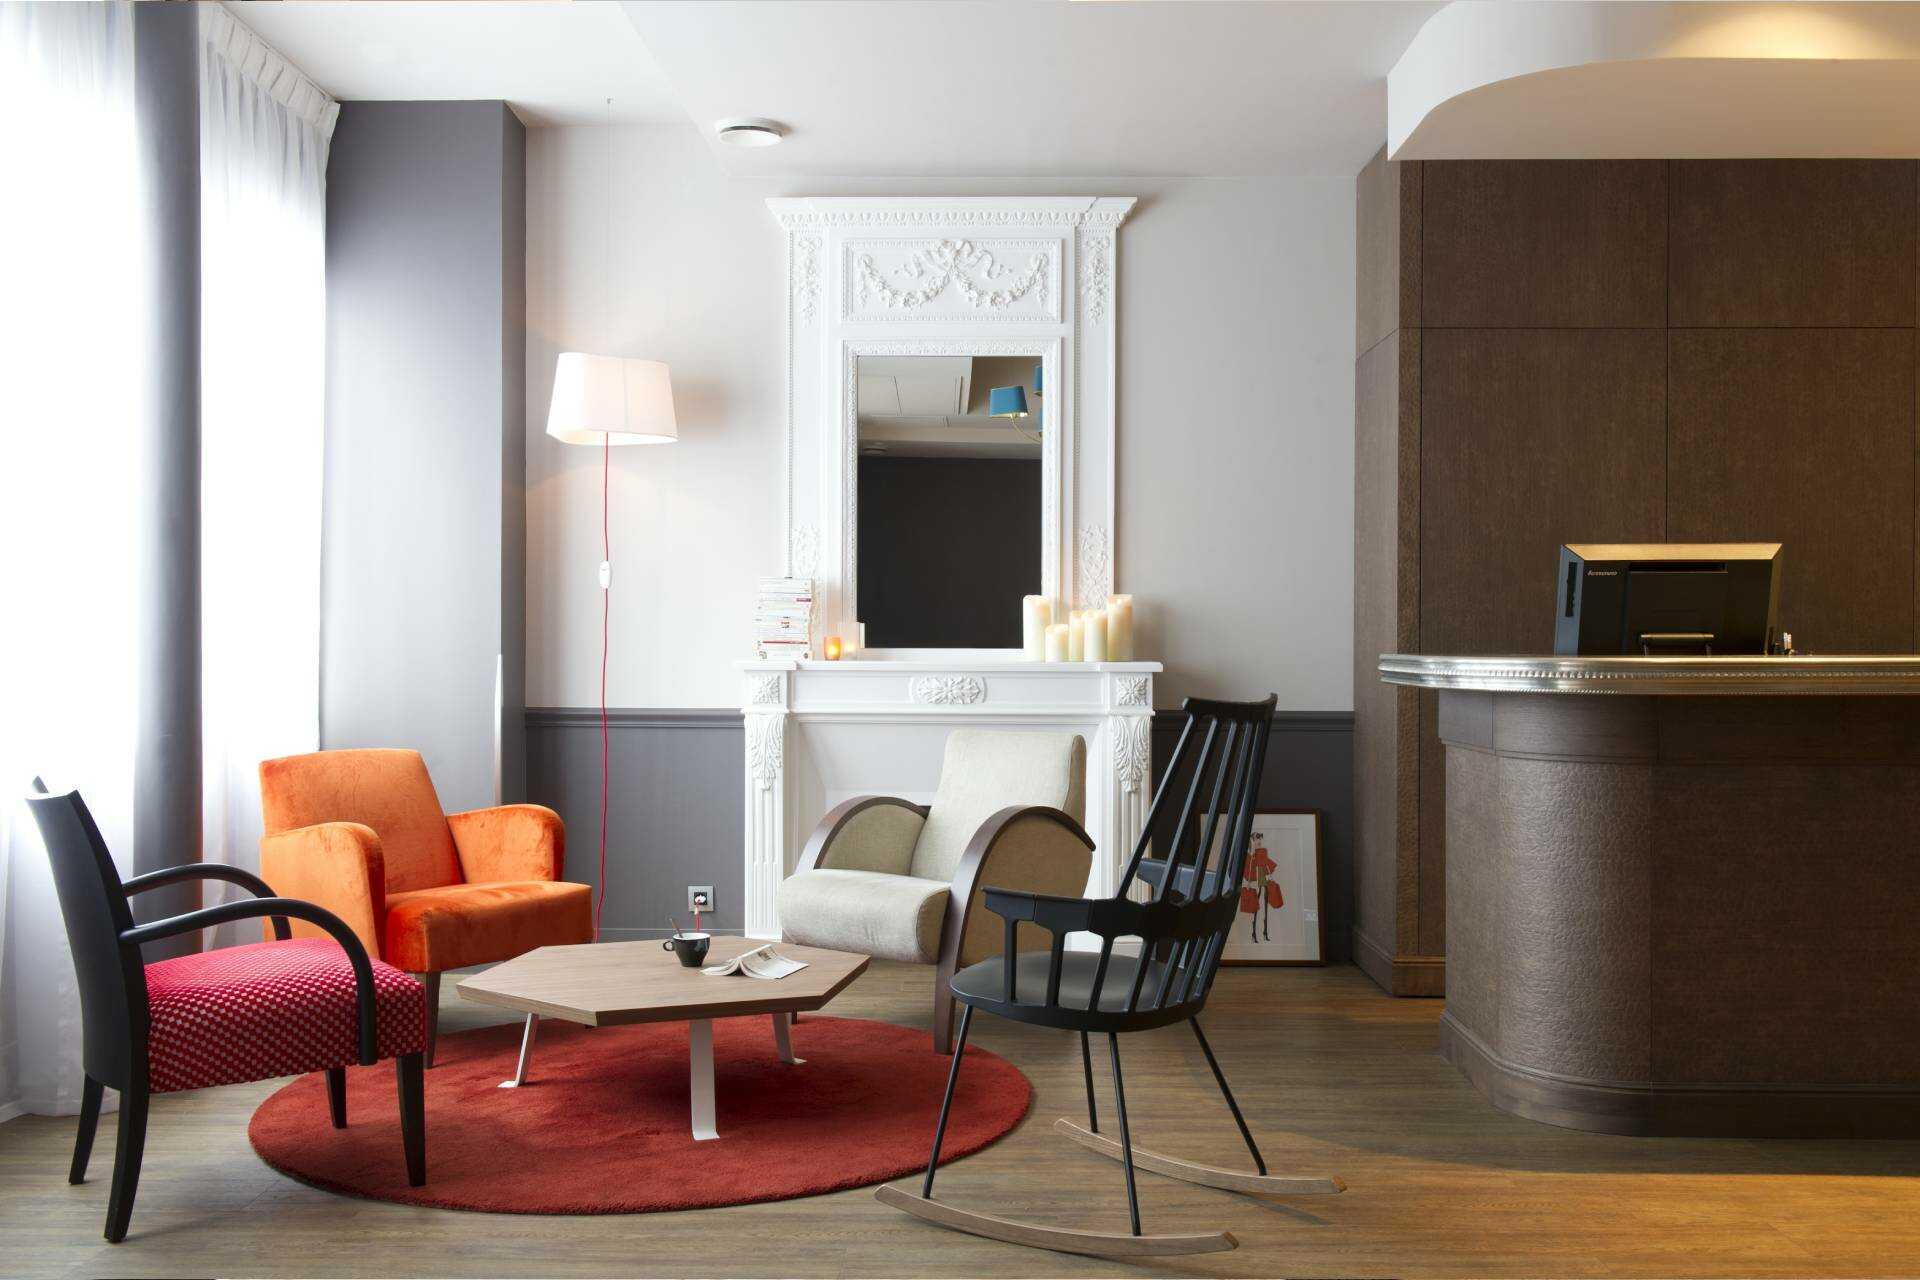 hotel_magenta38_by_happyculture.jpg